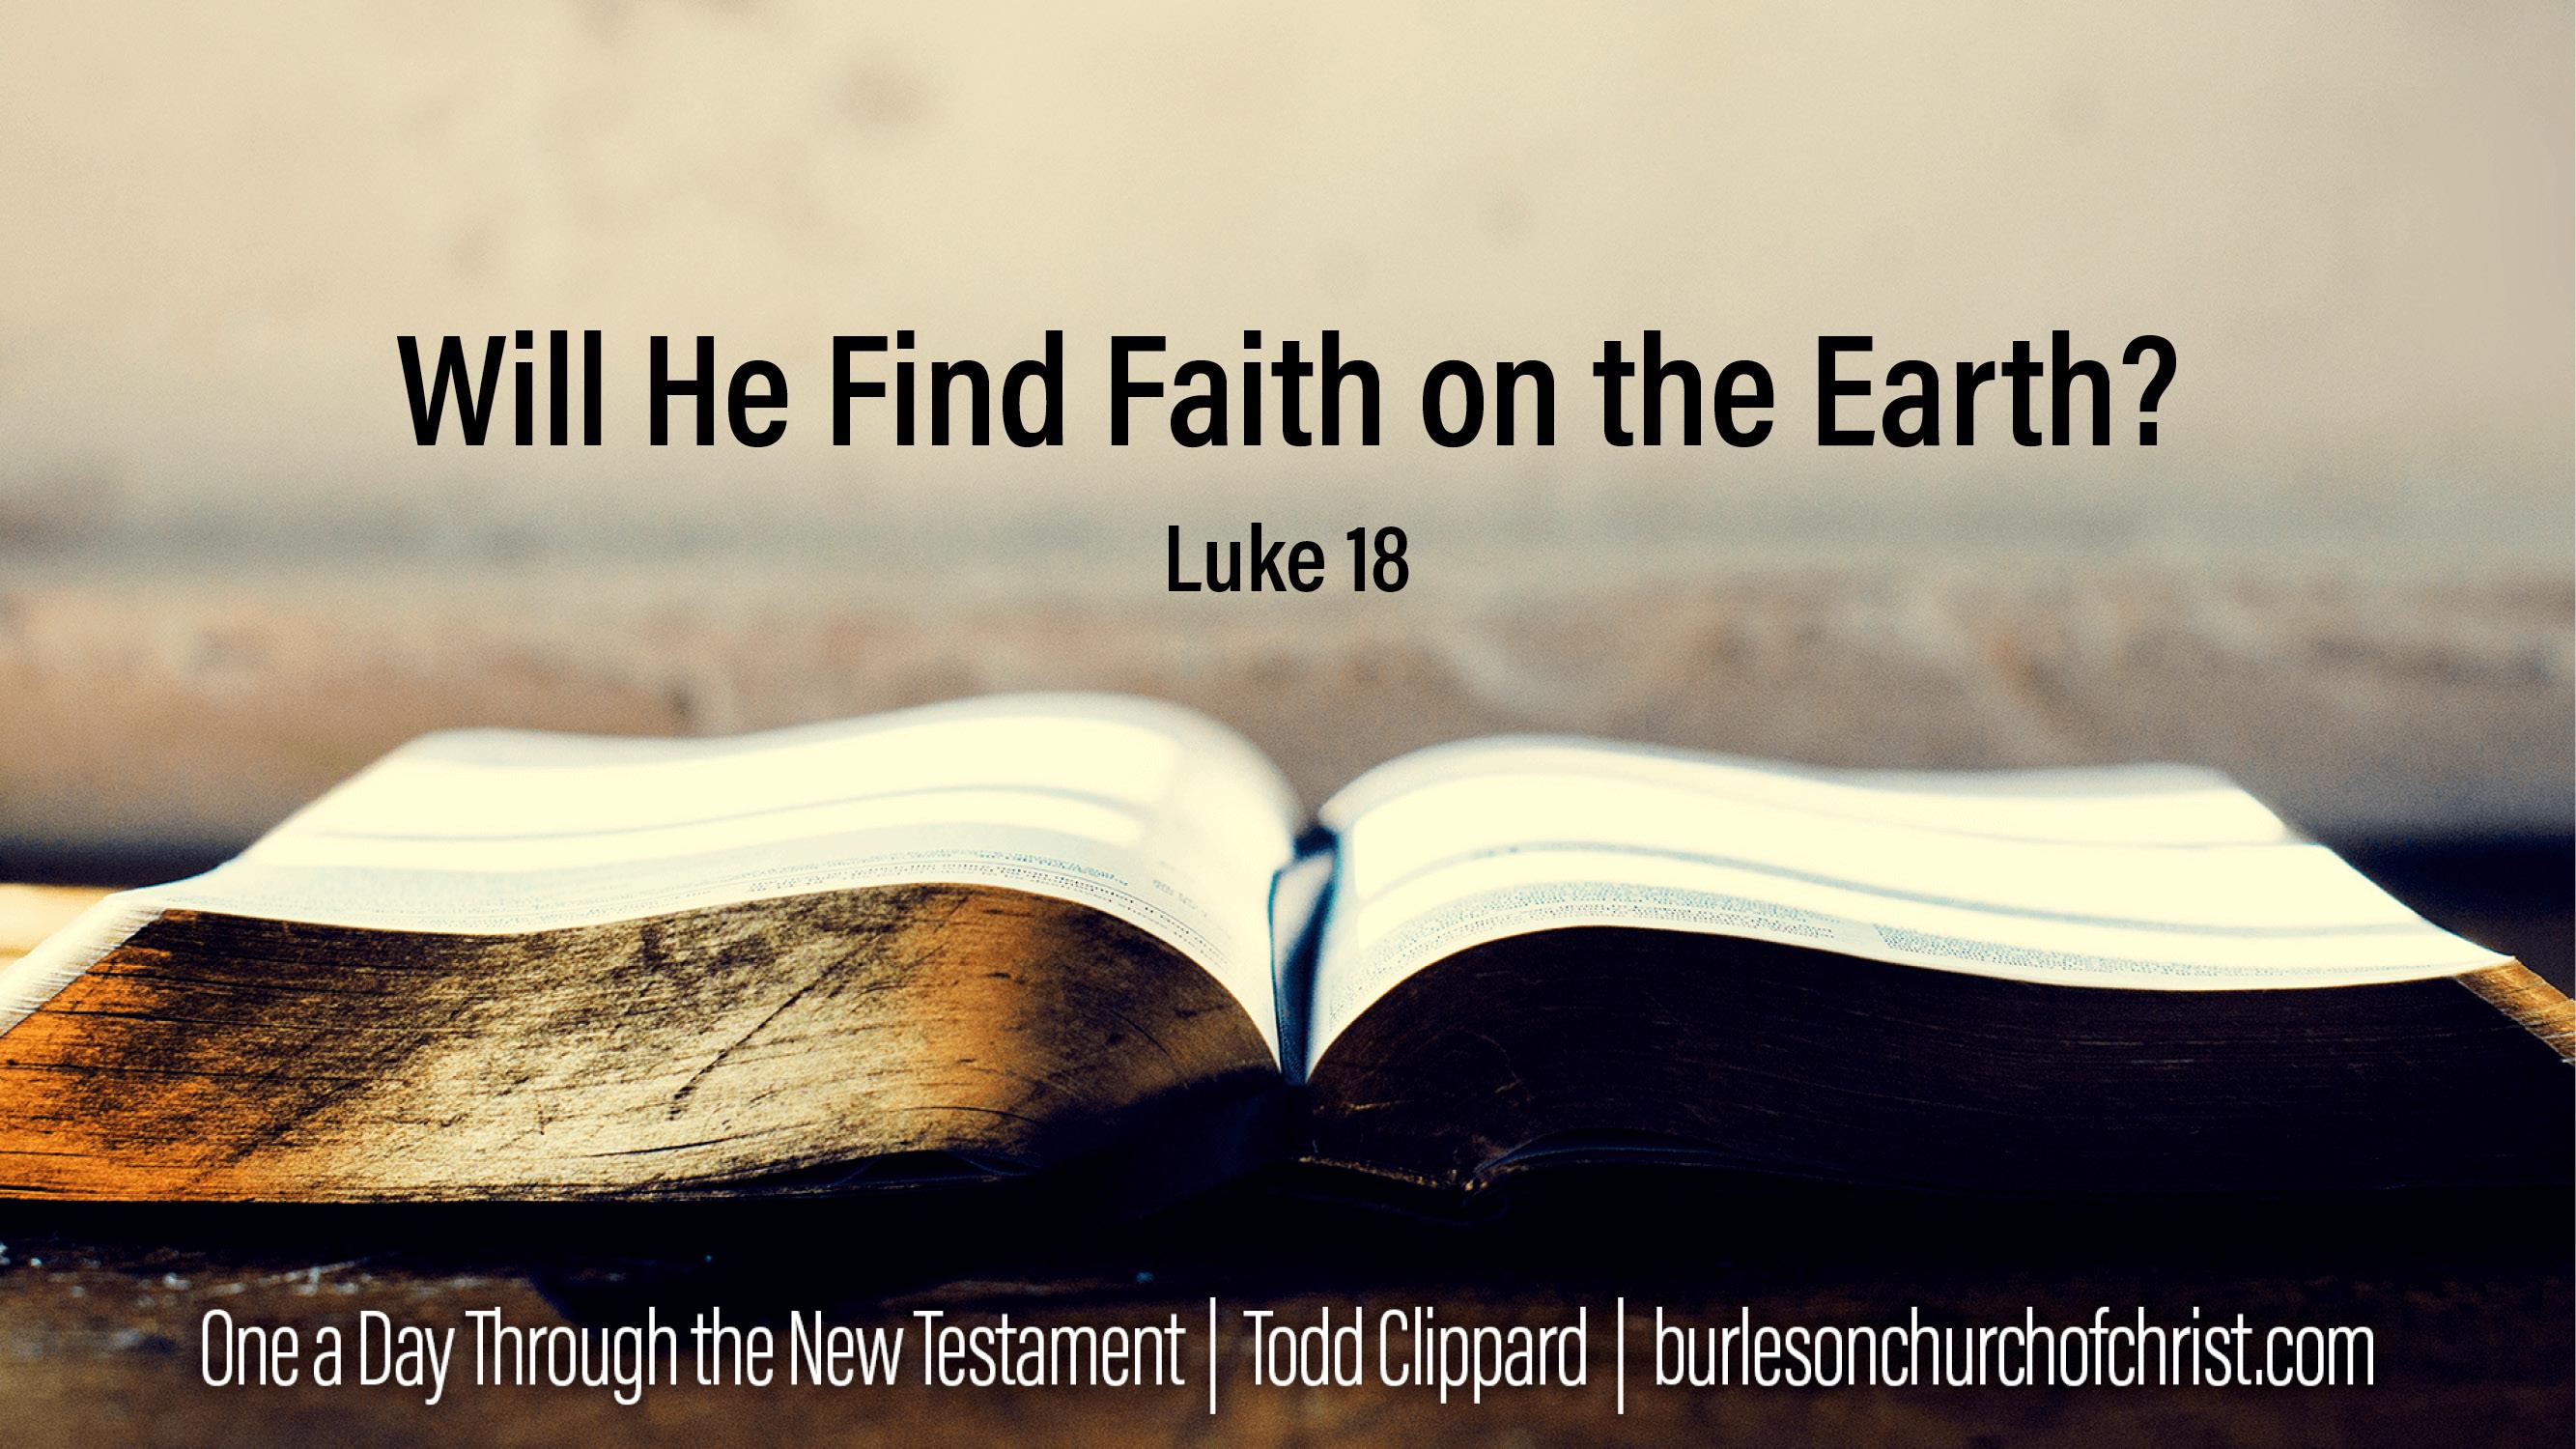 Luke 18: Will He Find Faith On The Earth?